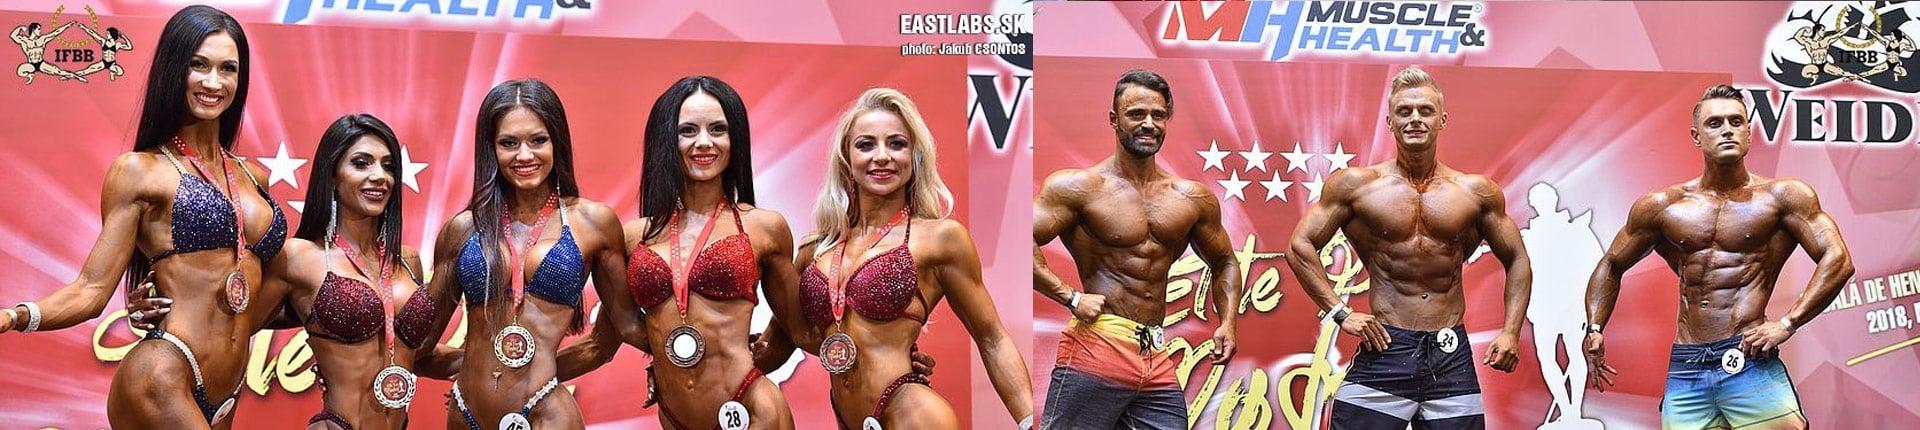 Polacy na IFBB ELITE PRO - Madryt 2018